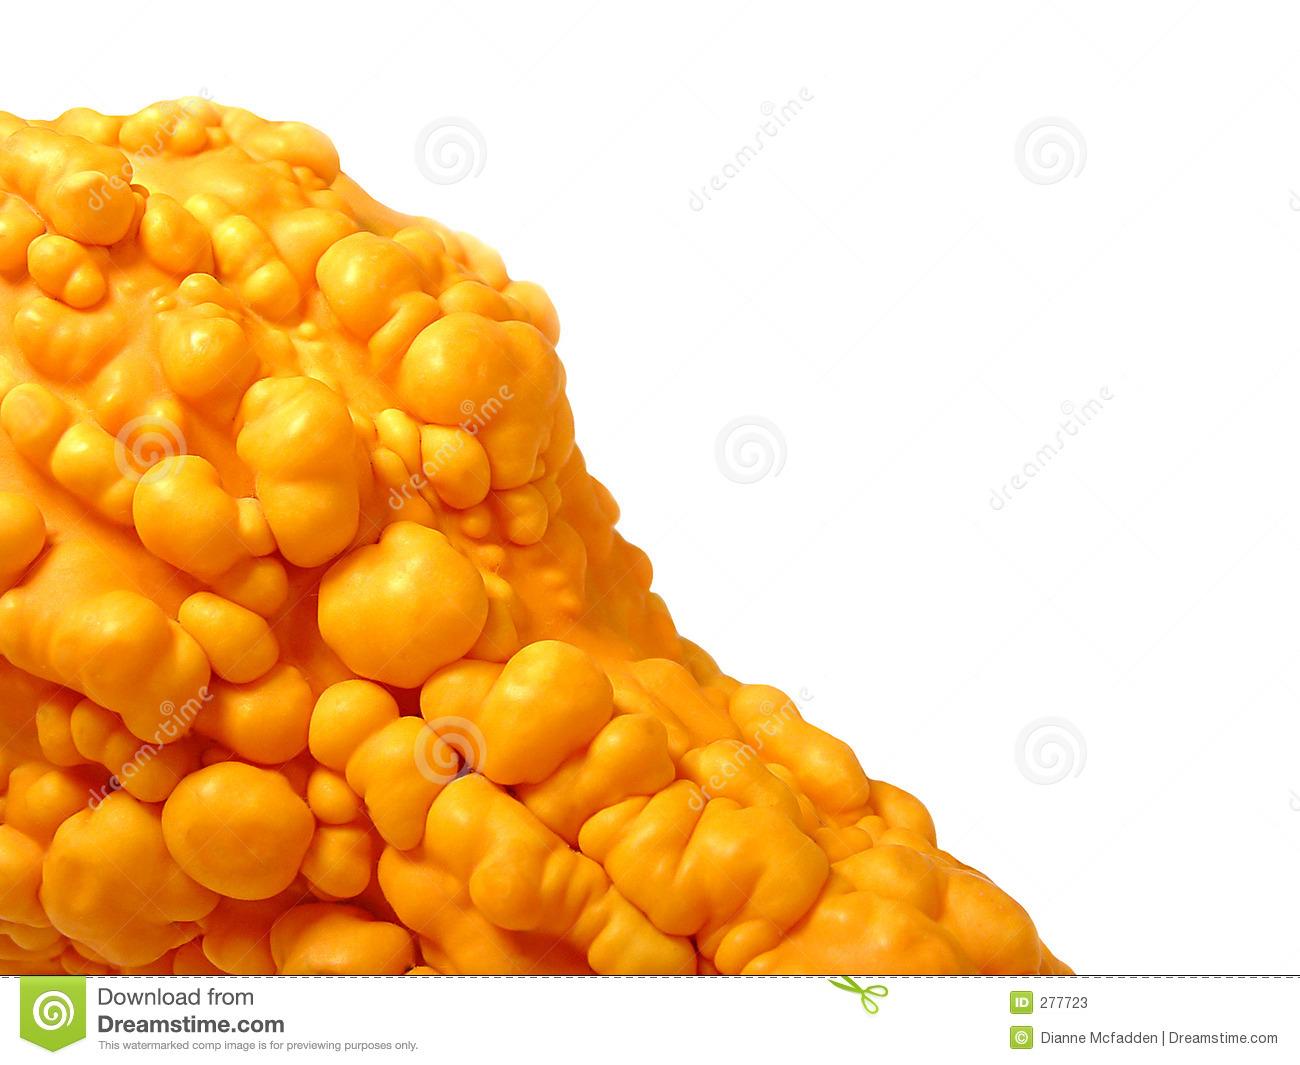 Orange Bumpy Gourd Stock Photos.